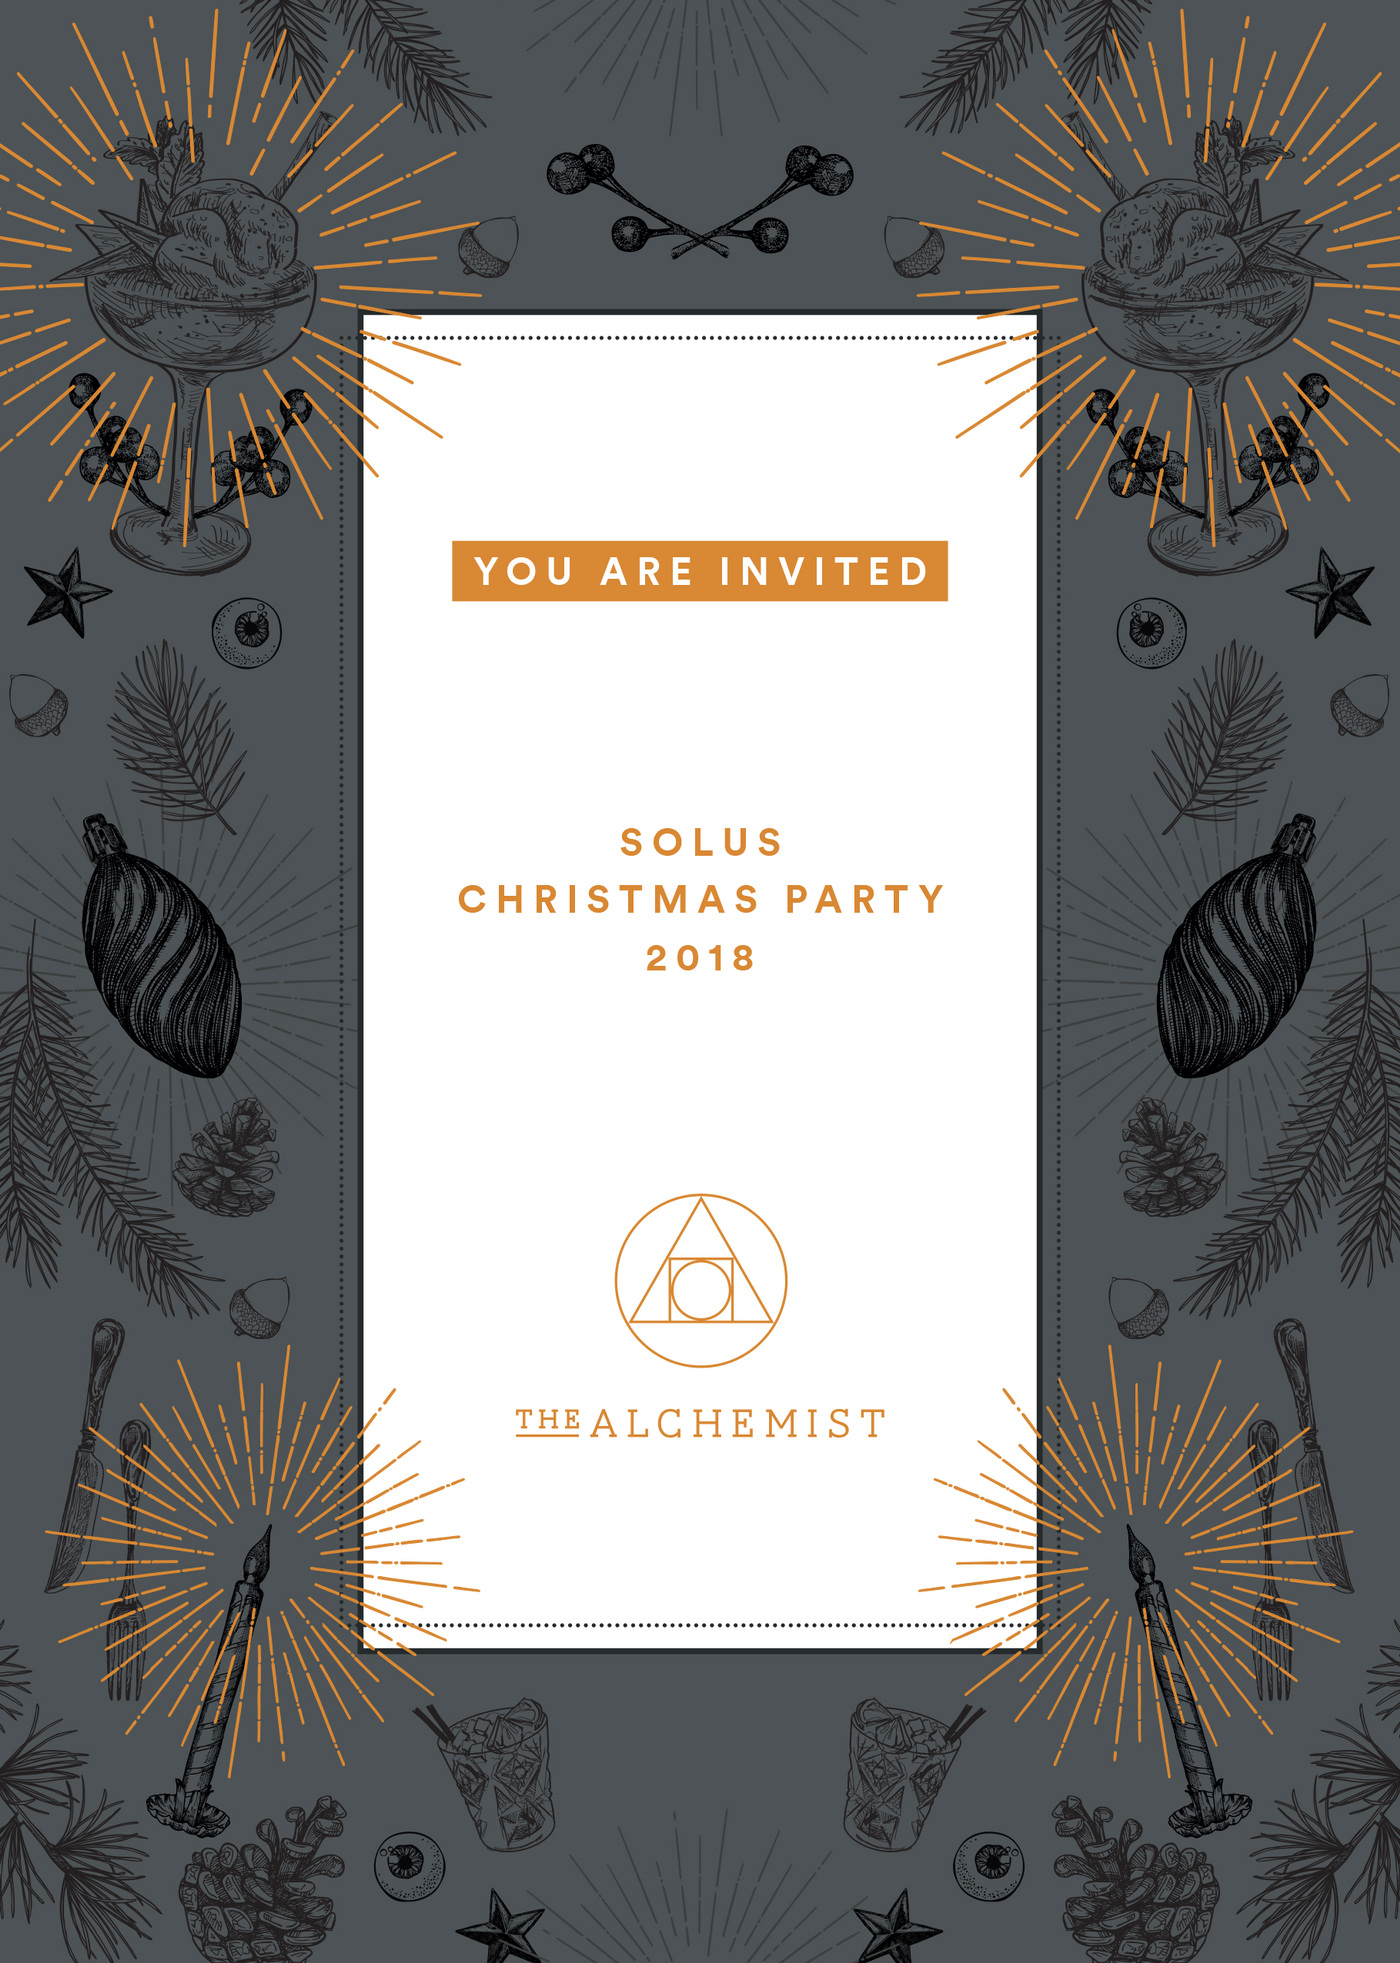 Lara-Jane van Antwerpen - Christmas Office Invite Front